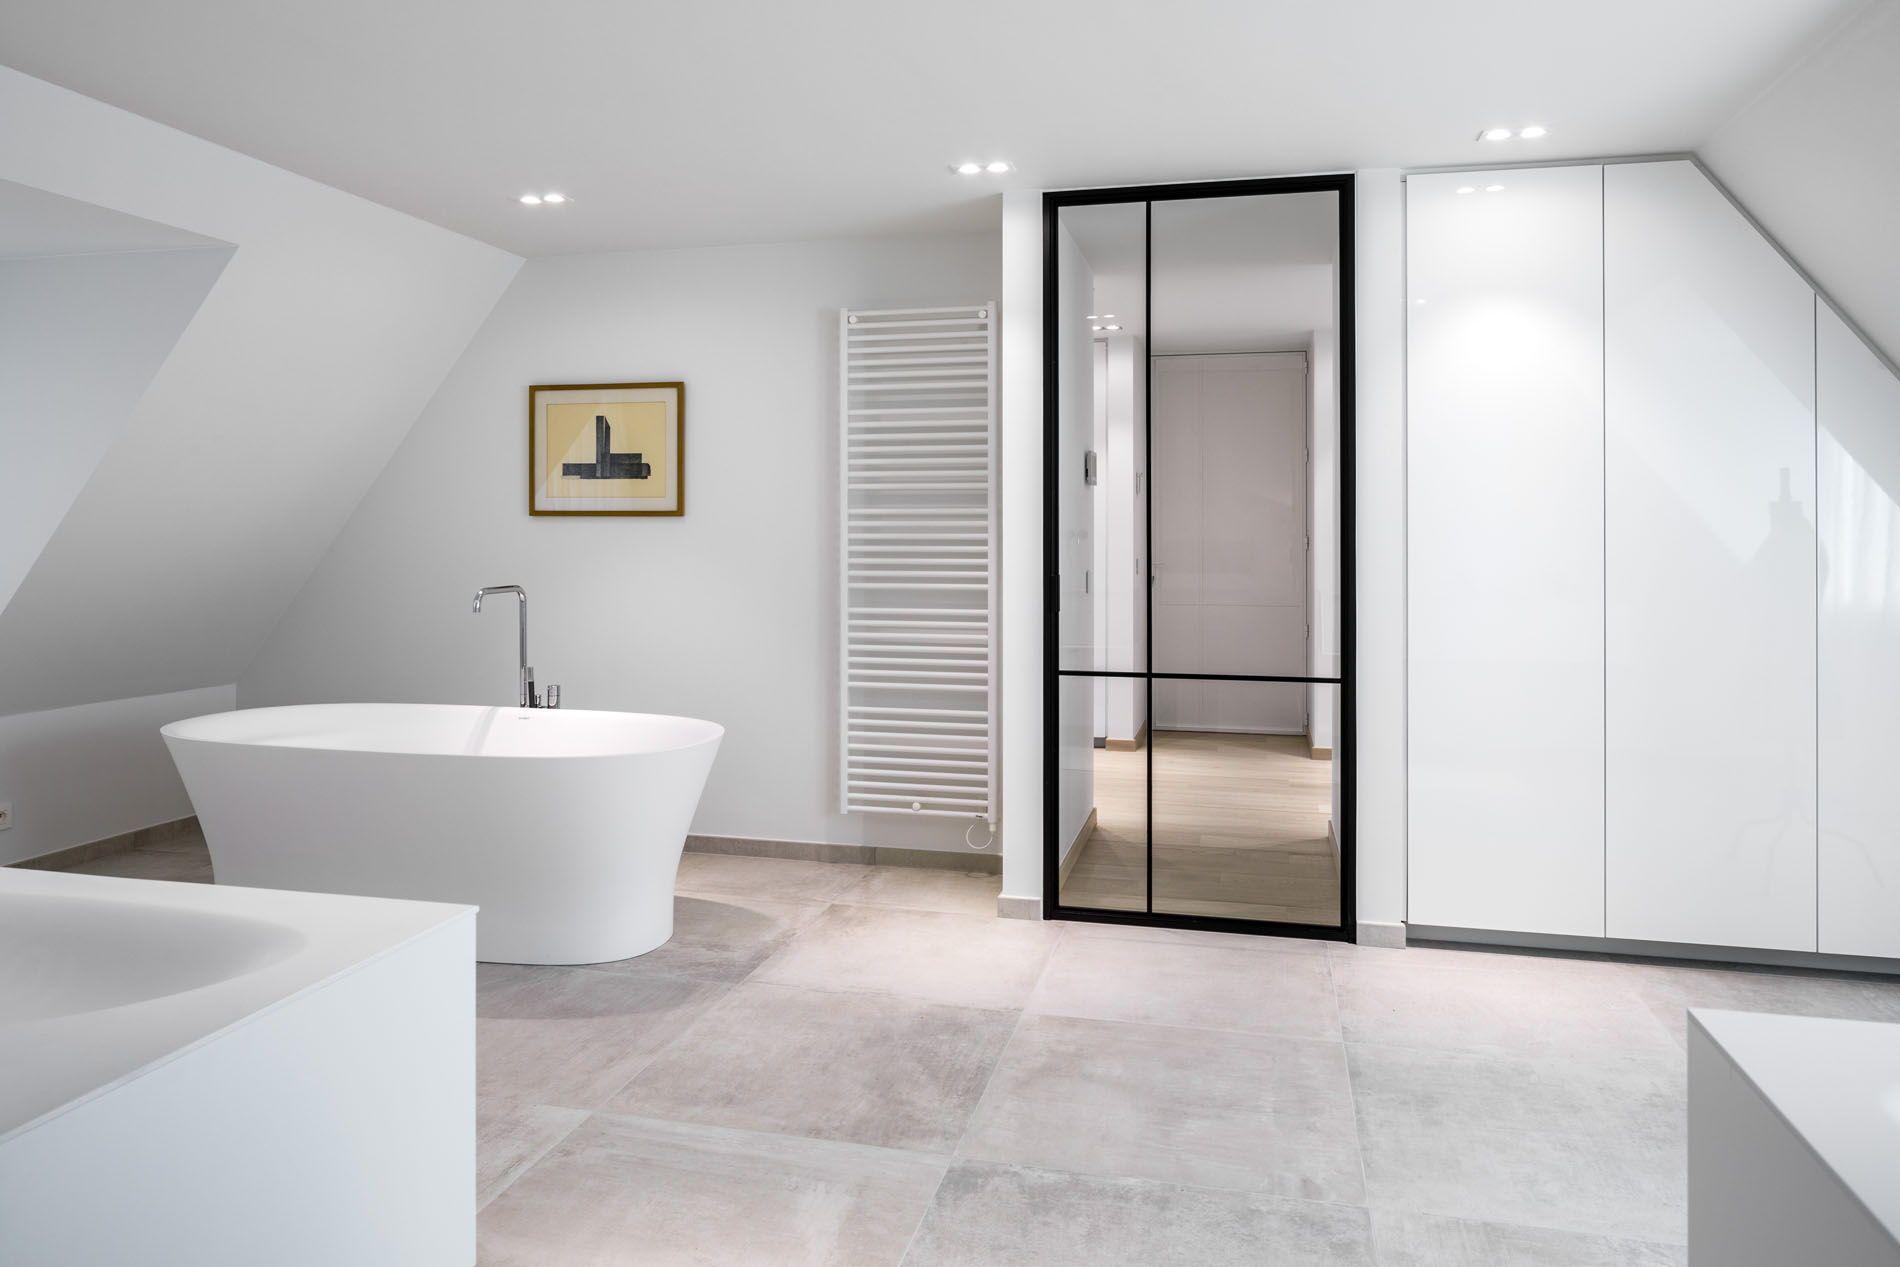 Bathroom Ceiling Lighting Ideas Smart Cake Bathroom Recessed Lighting Bathroom Lighting Best Bathroom Lighting Bathroom lights ideas png